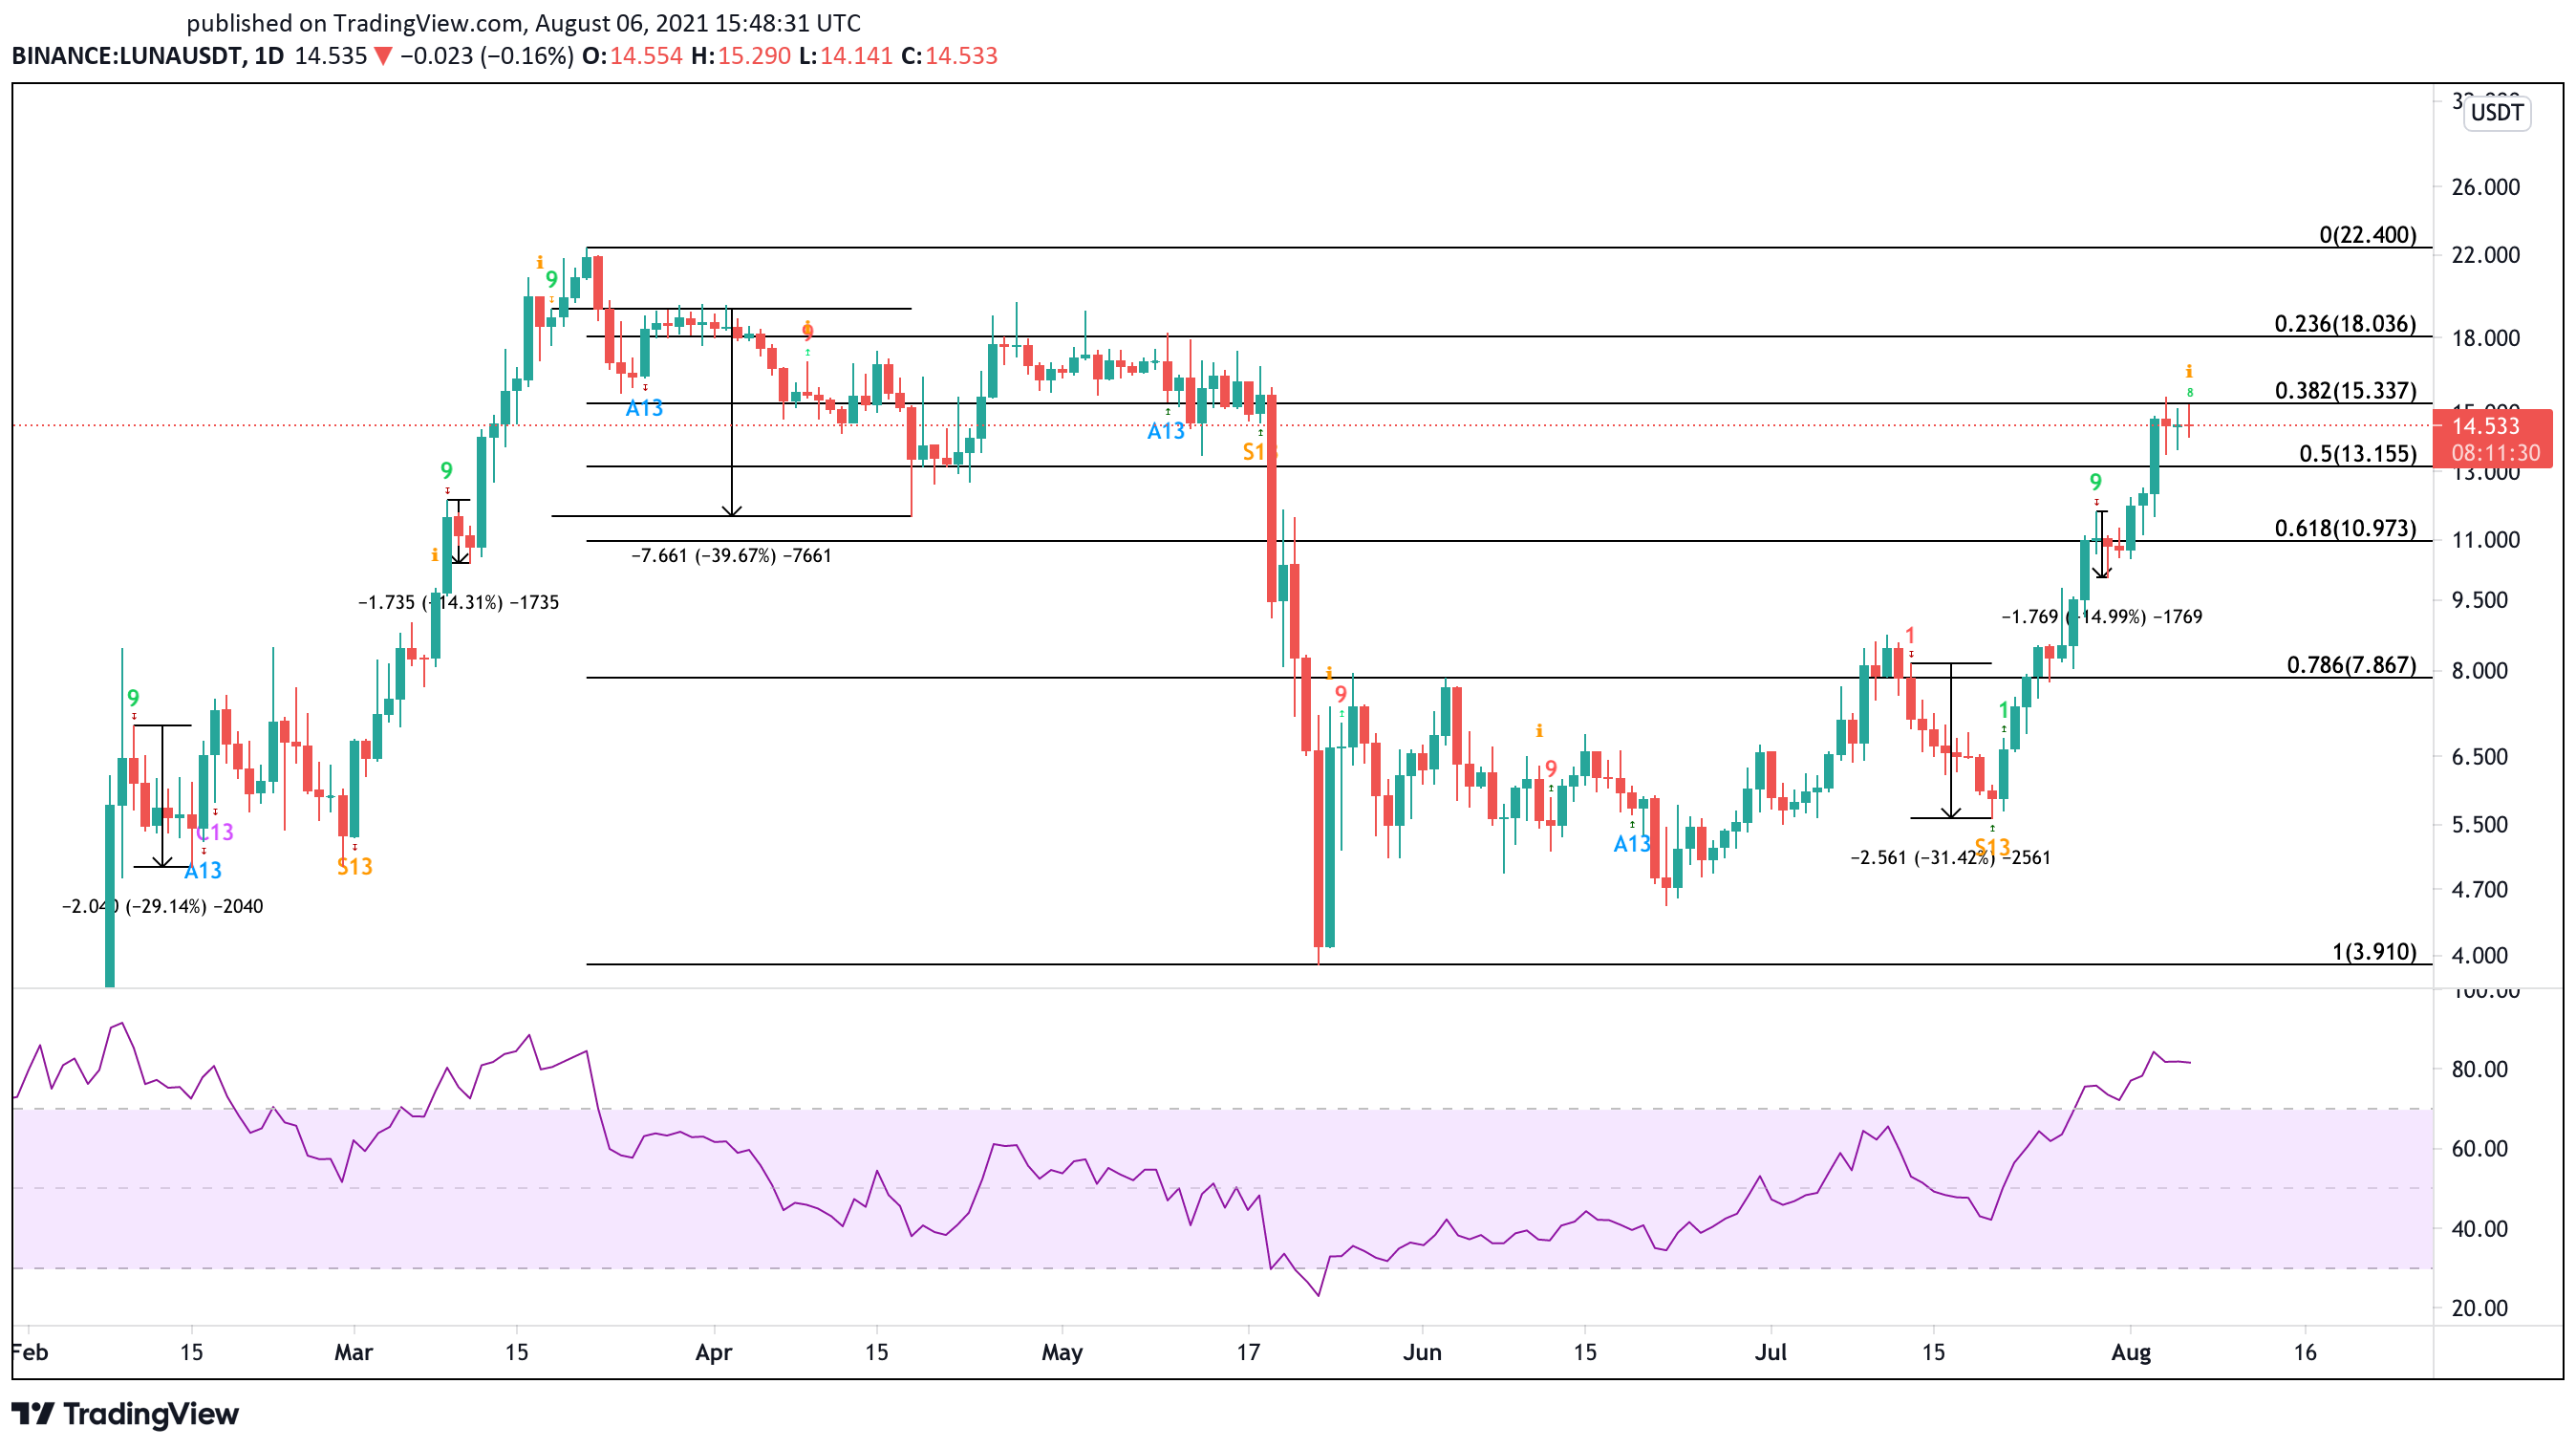 Terra LUNA US dollar price chart